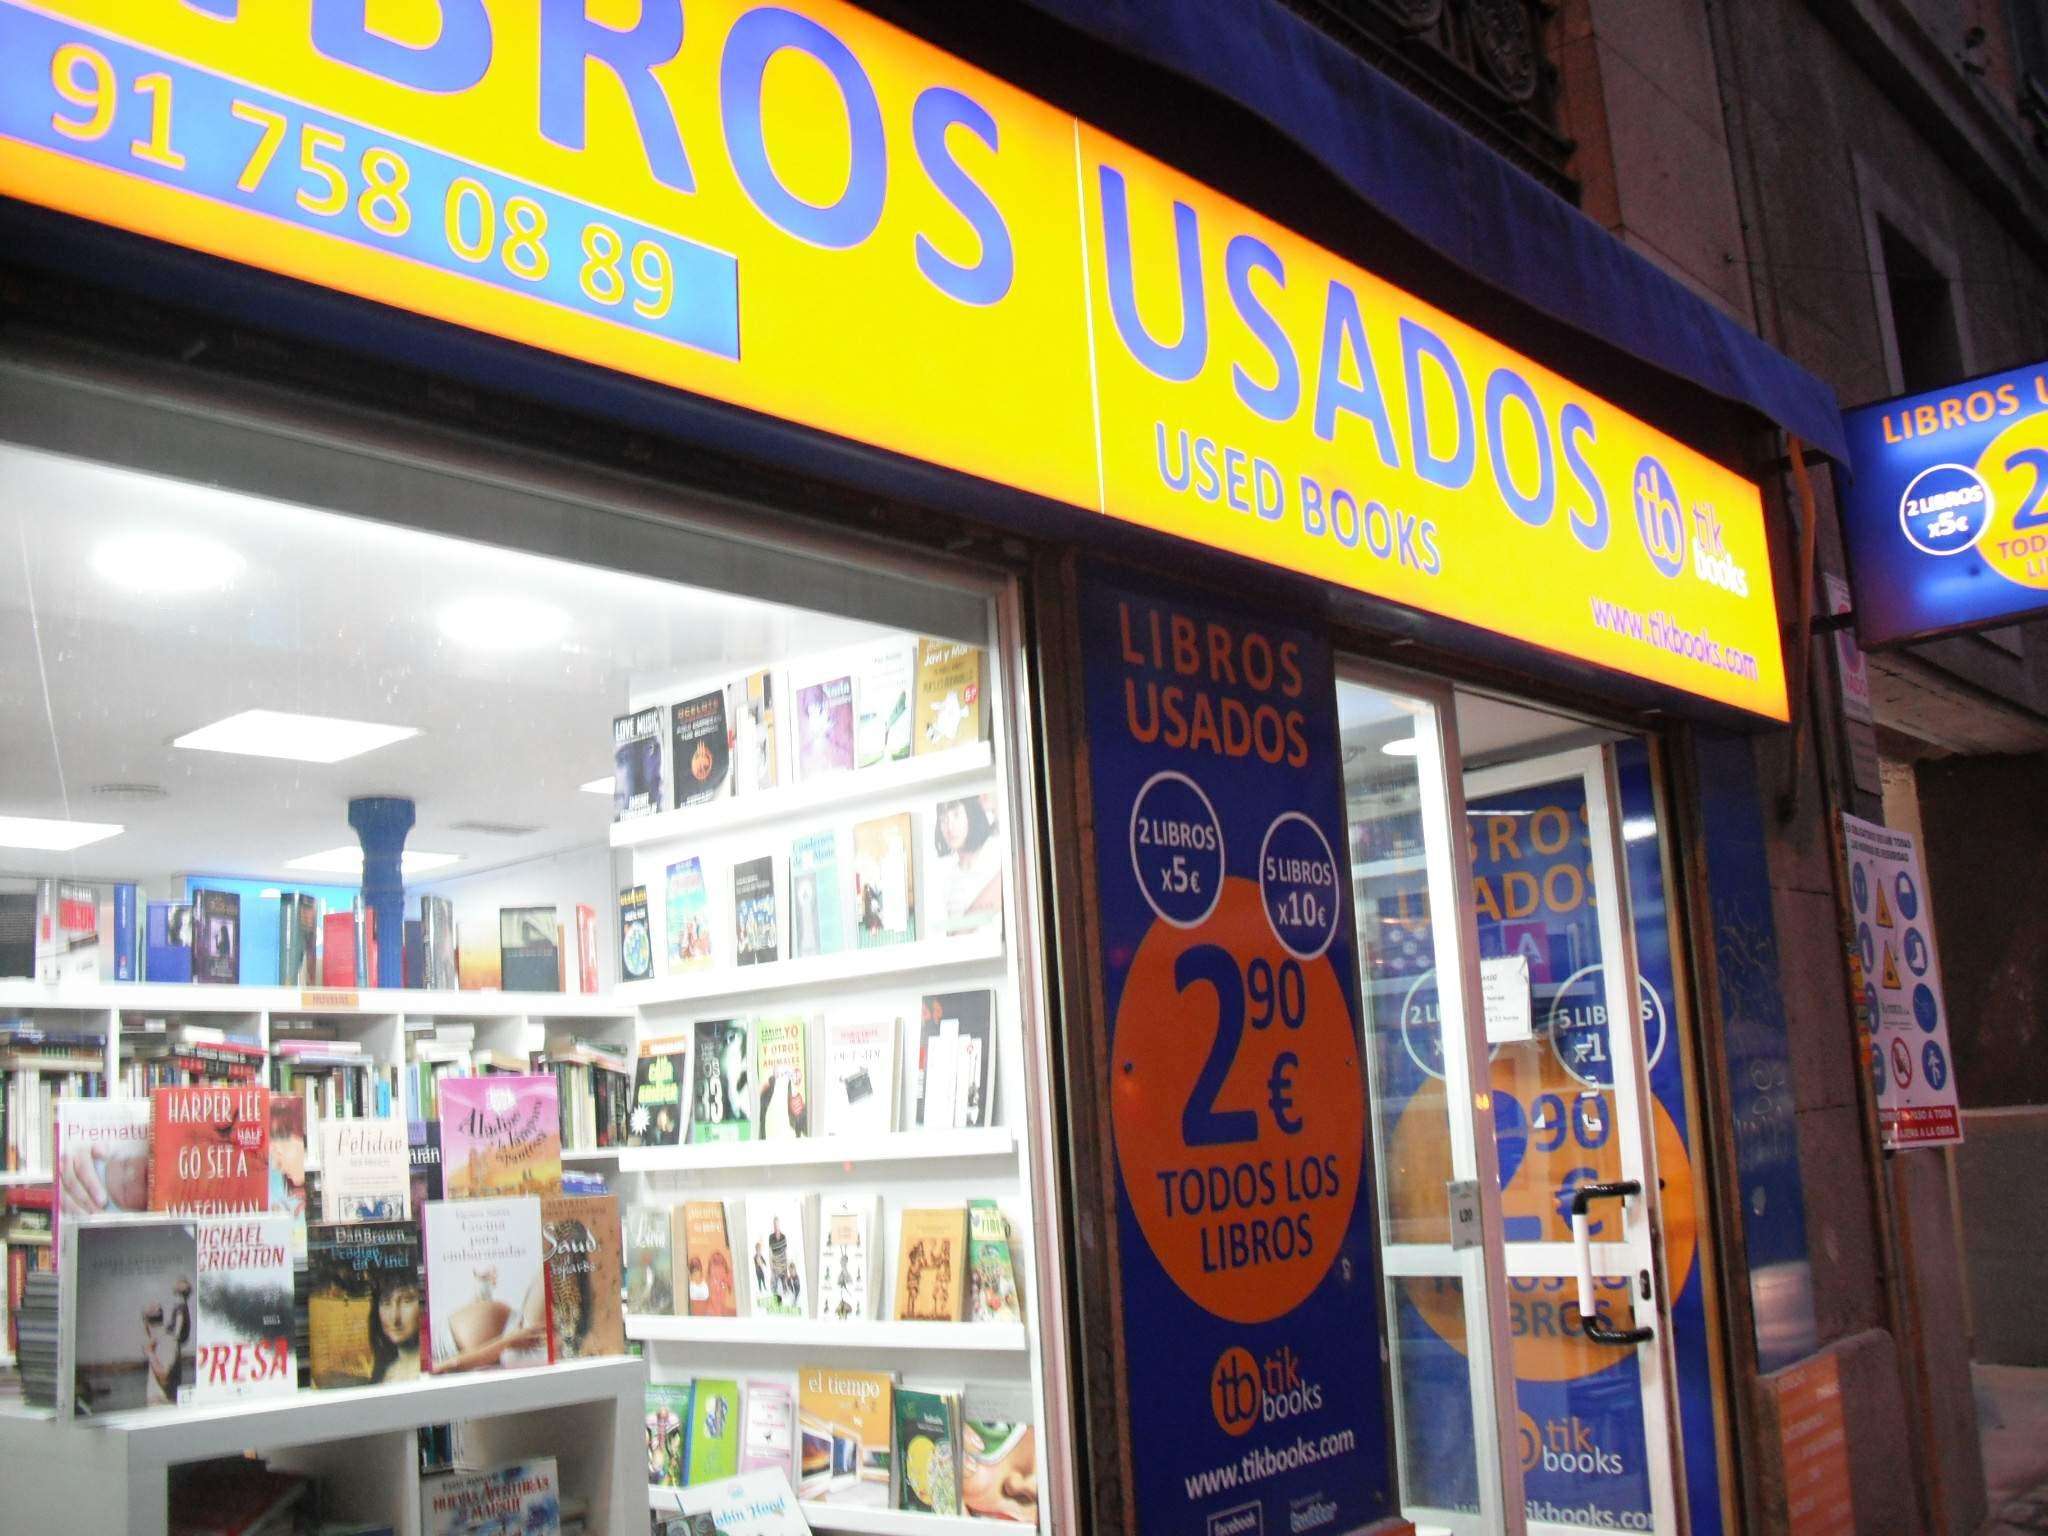 File:Madrid - Libros usados Tikbooks (tienda de Calle San Bernardo).jpg - Wikimedia Commons